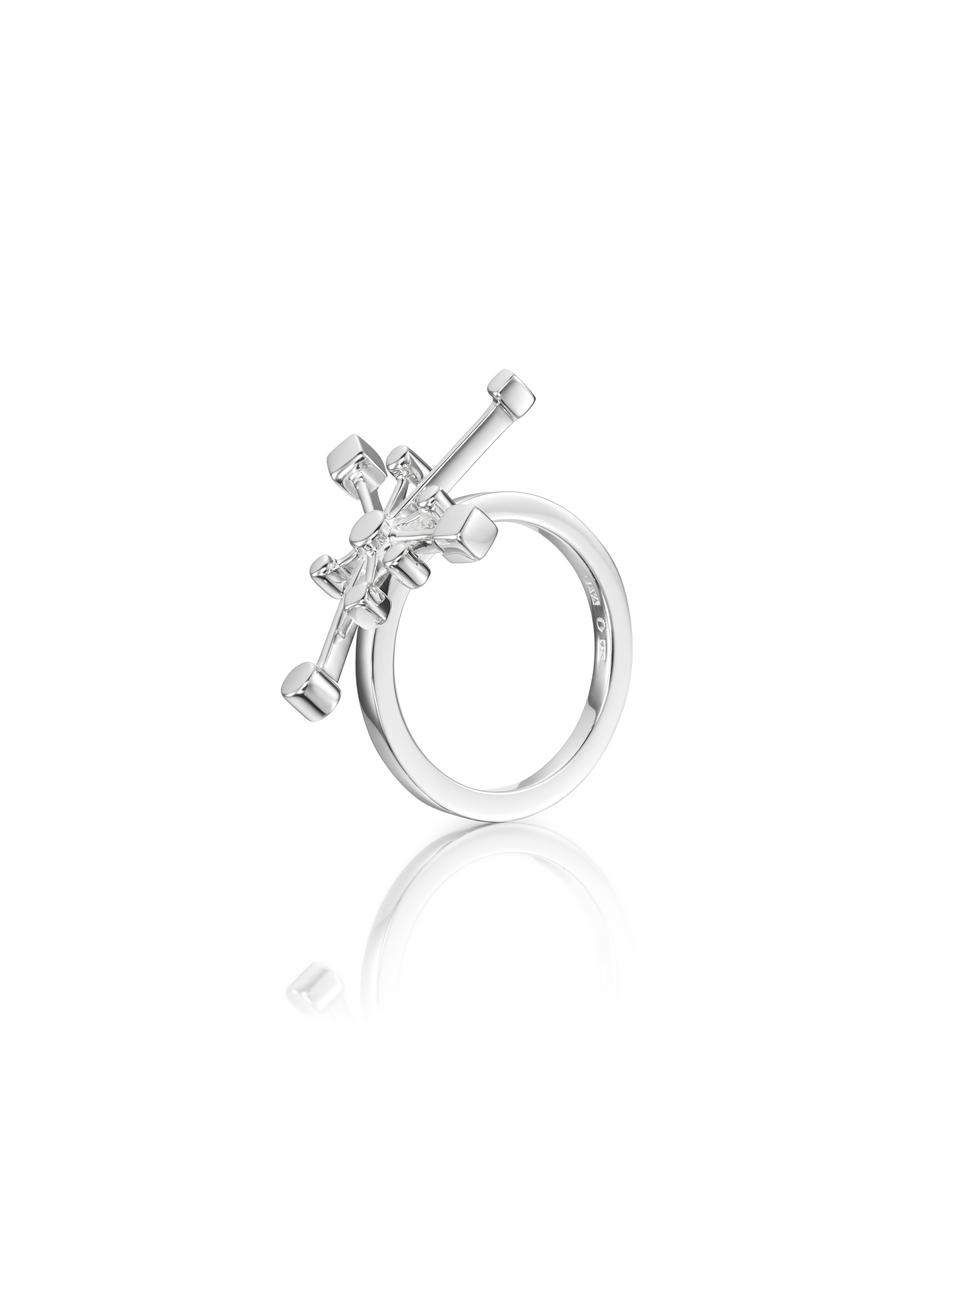 Little Kaboom Ring 13-100-01309(1)